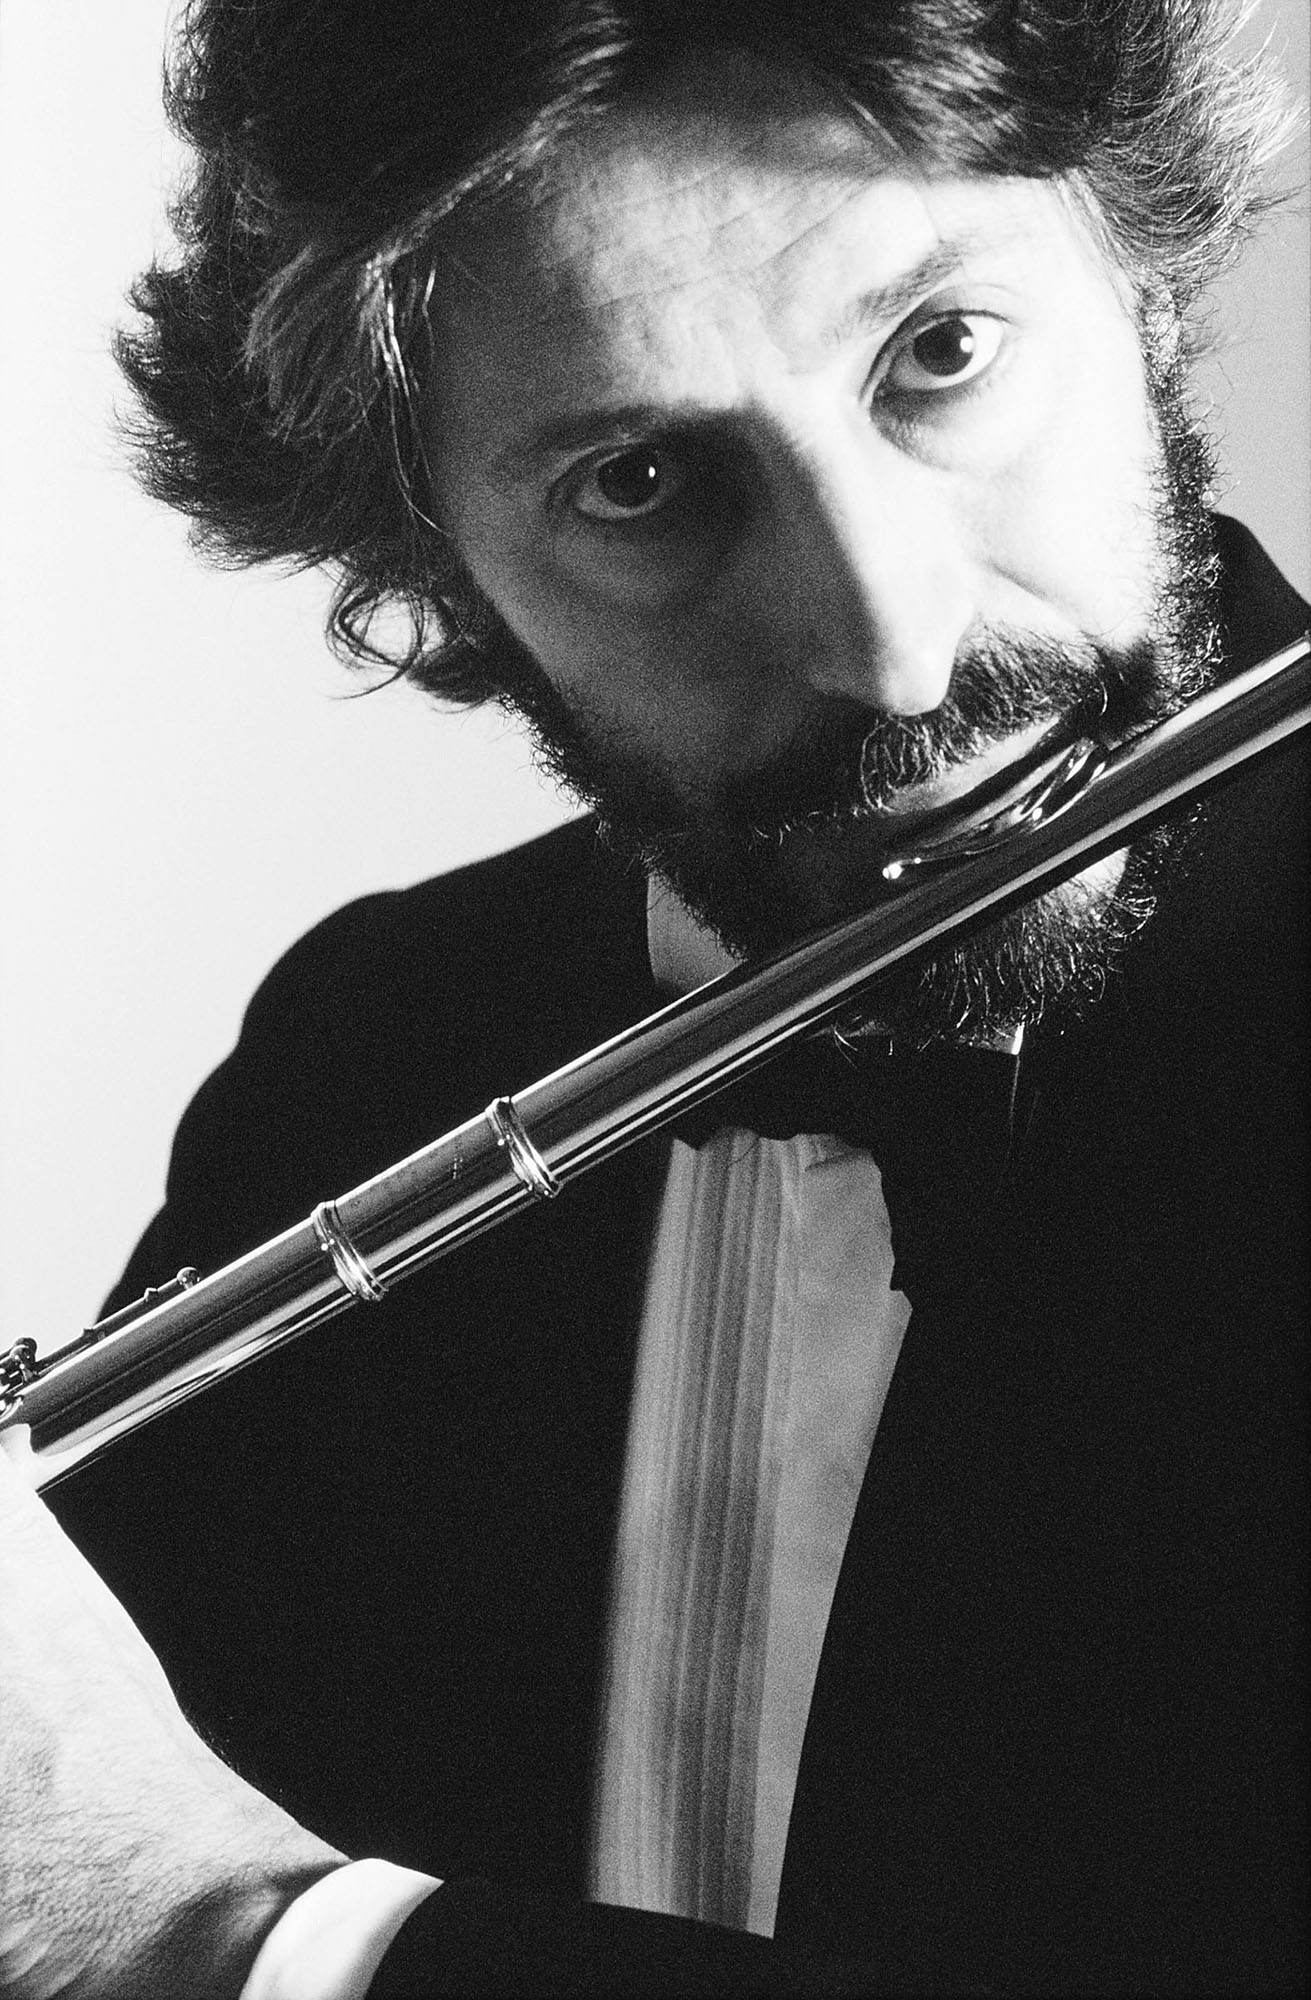 gümüşlük festivali GÜMÜŞLÜK FESTİVALİ YİNE DOPDOLU… gumusluk festivali Raffaele Trevisani